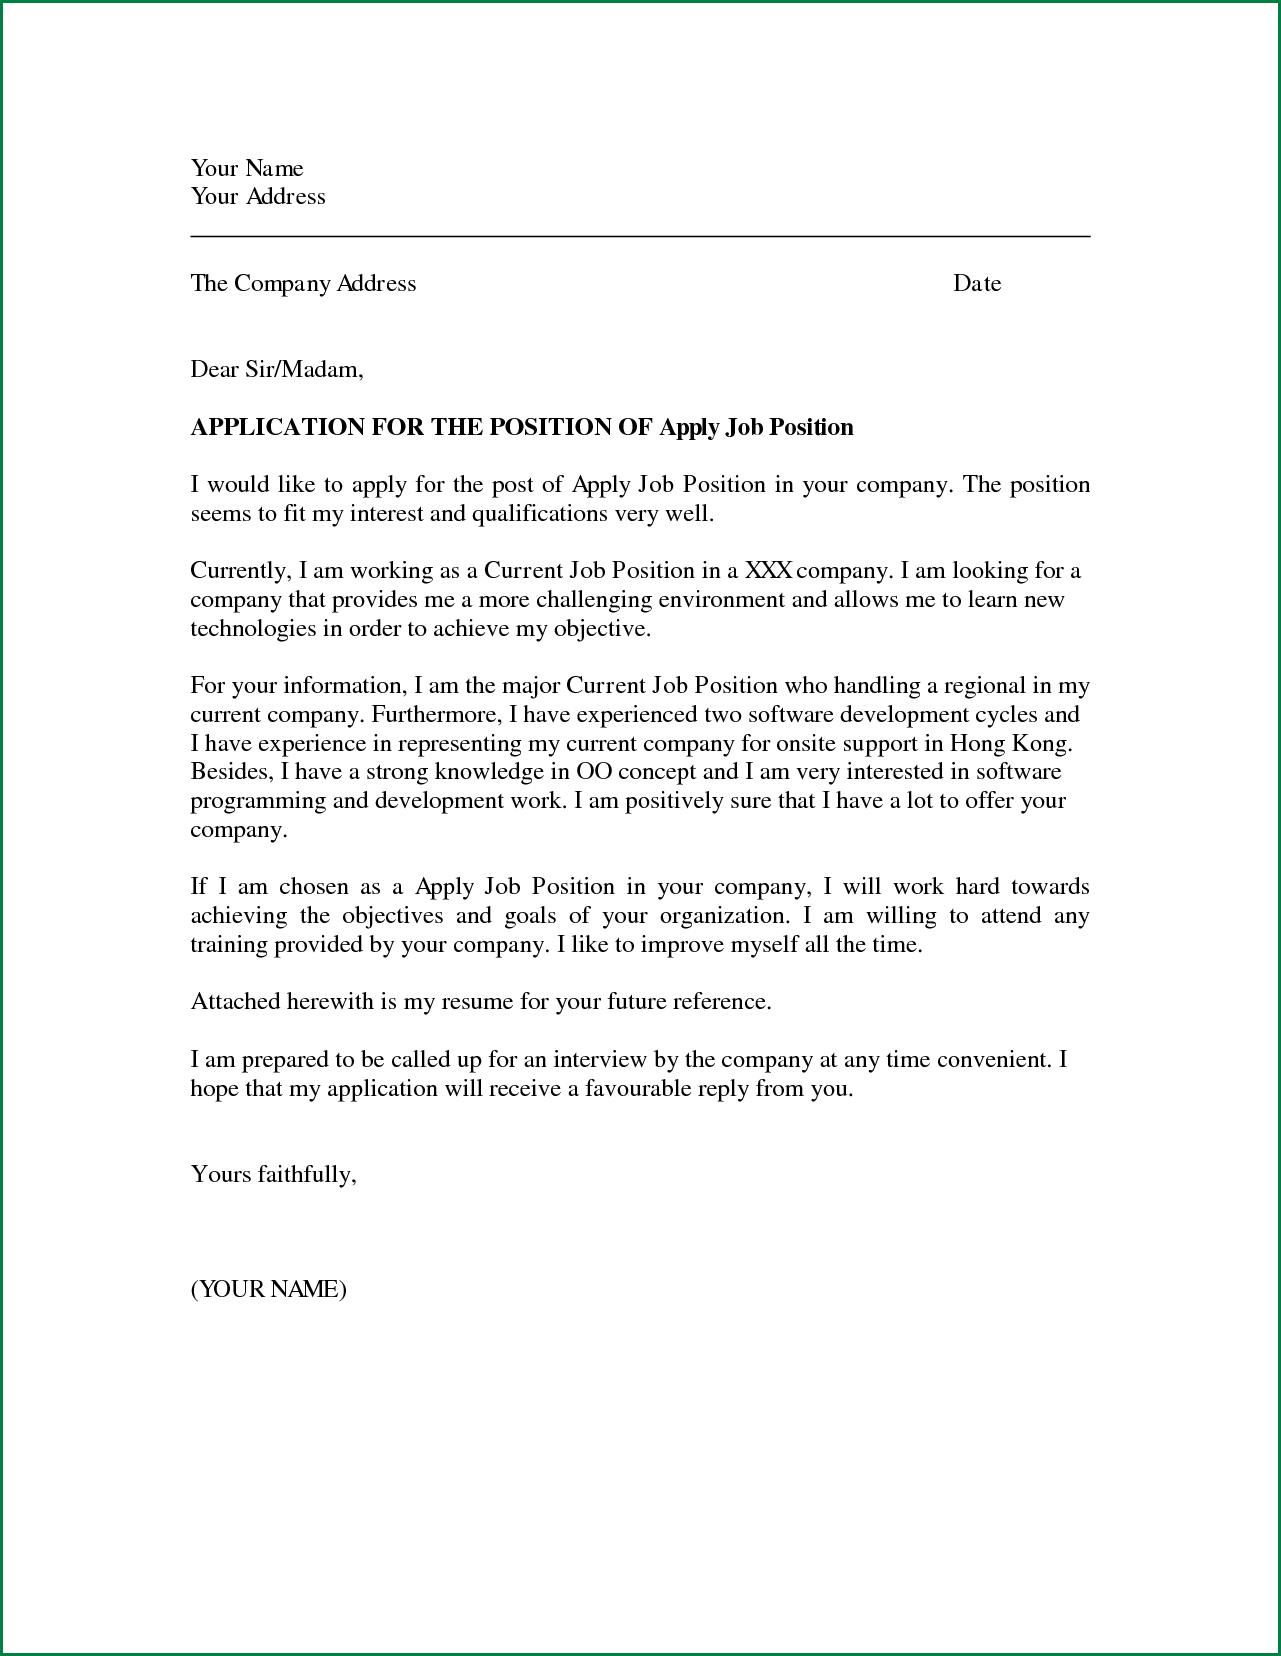 https://aussieessaywriter.com.au/dissertation-writing/